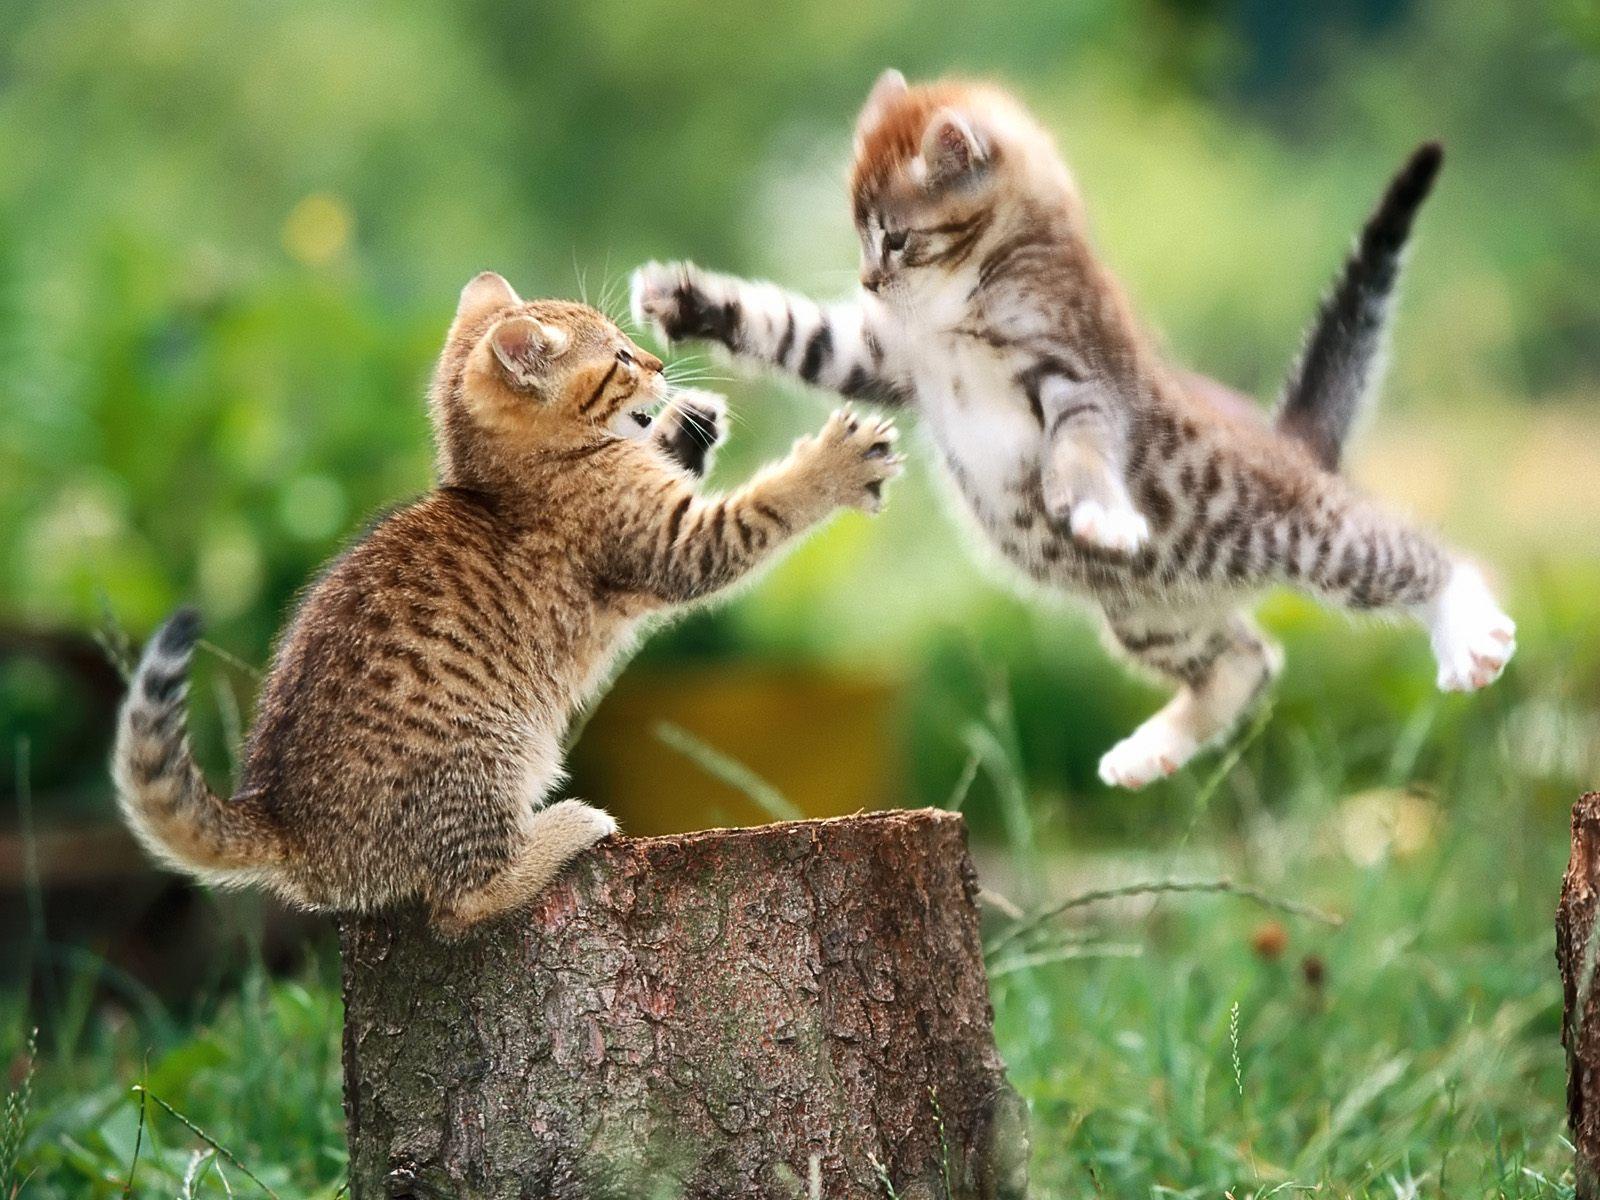 http://4.bp.blogspot.com/-SRfEfy52hX8/T3YQQr8JsGI/AAAAAAAAAXY/lVR74OBLKDE/s1600/kittens+fighting.jpg